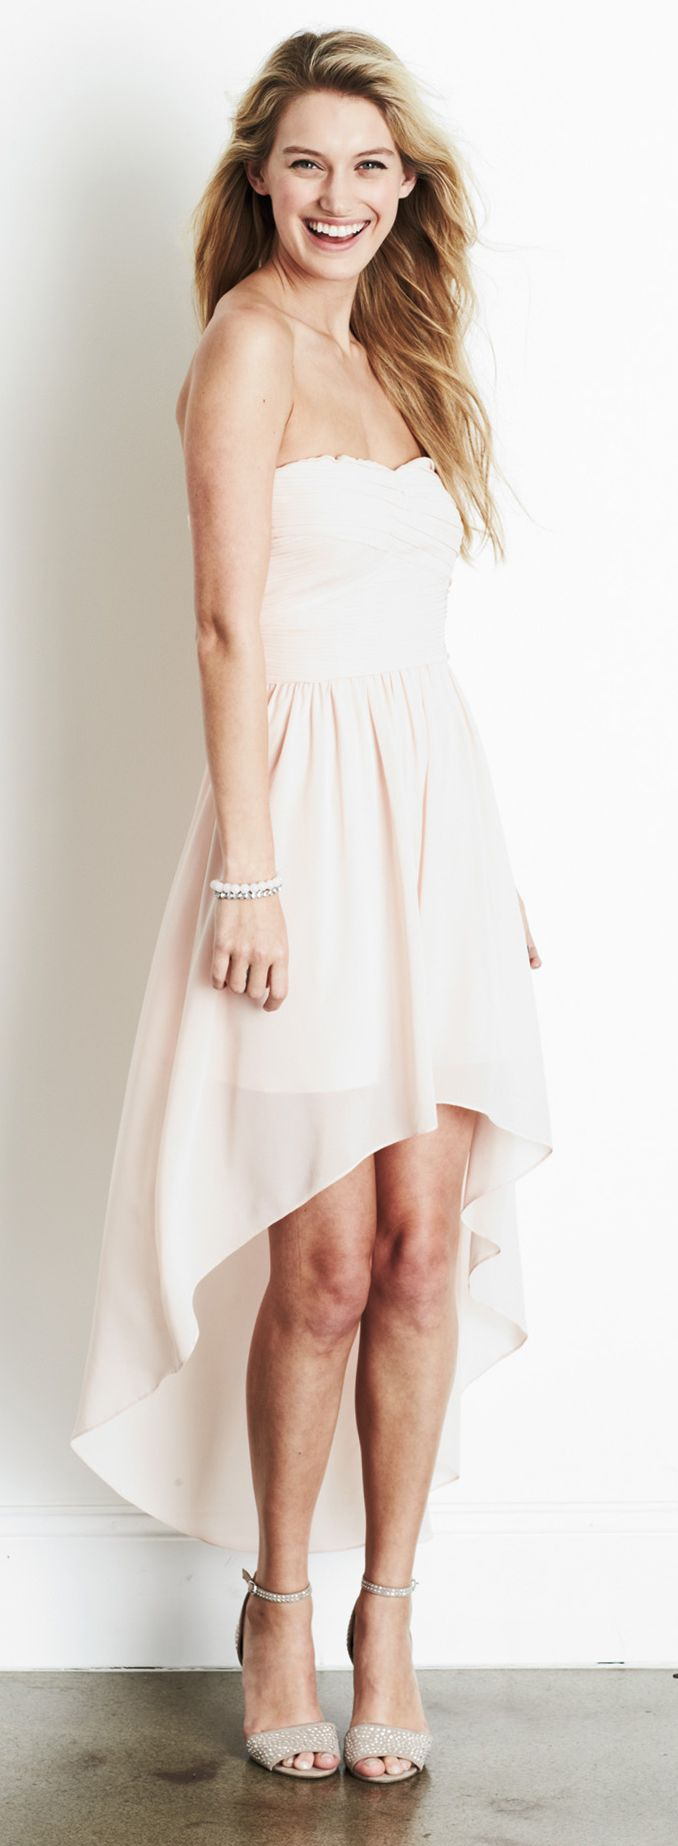 97 best Can\'t wait images on Pinterest | Formal dress, Party wear ...